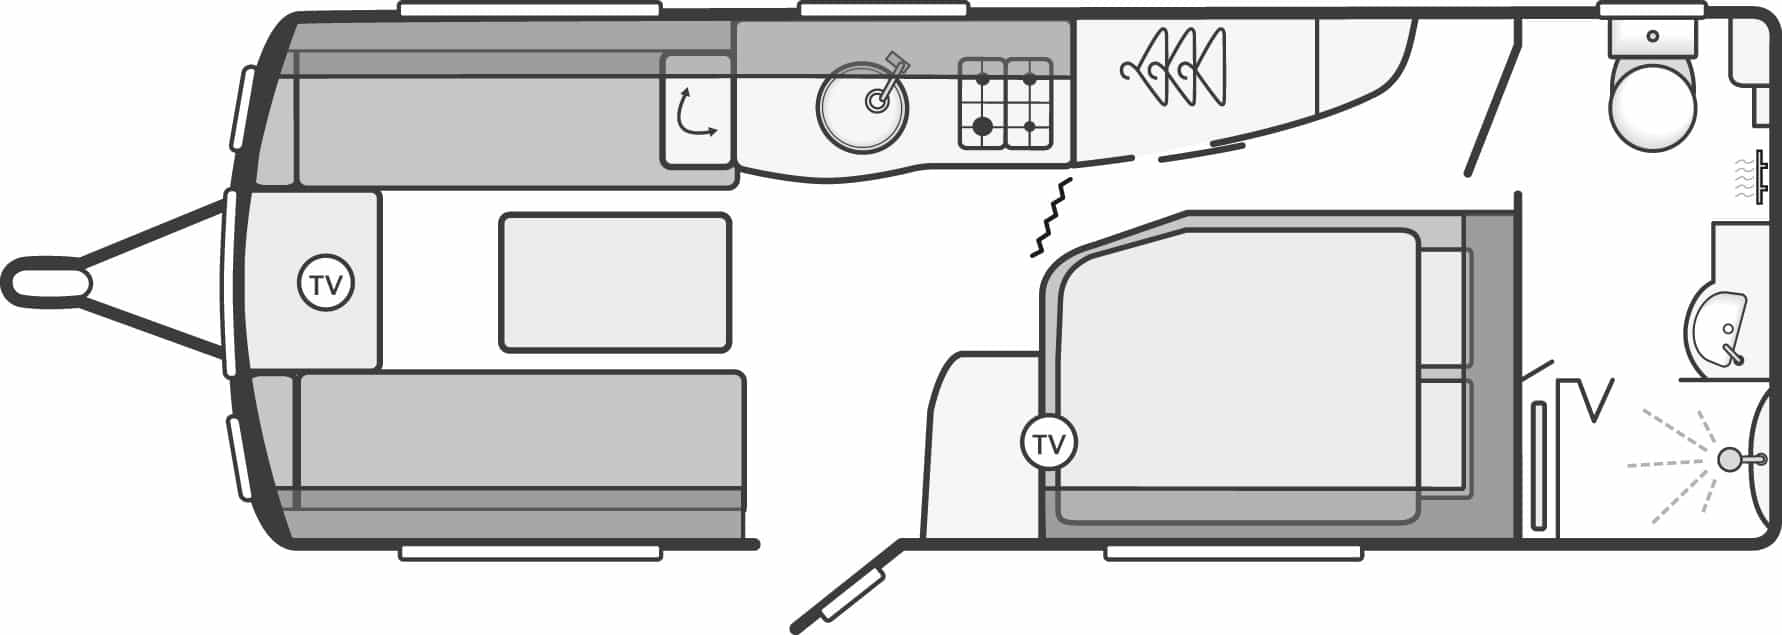 Elegance 570 - 4 Berth, Side Fixed Bed, End Washroom